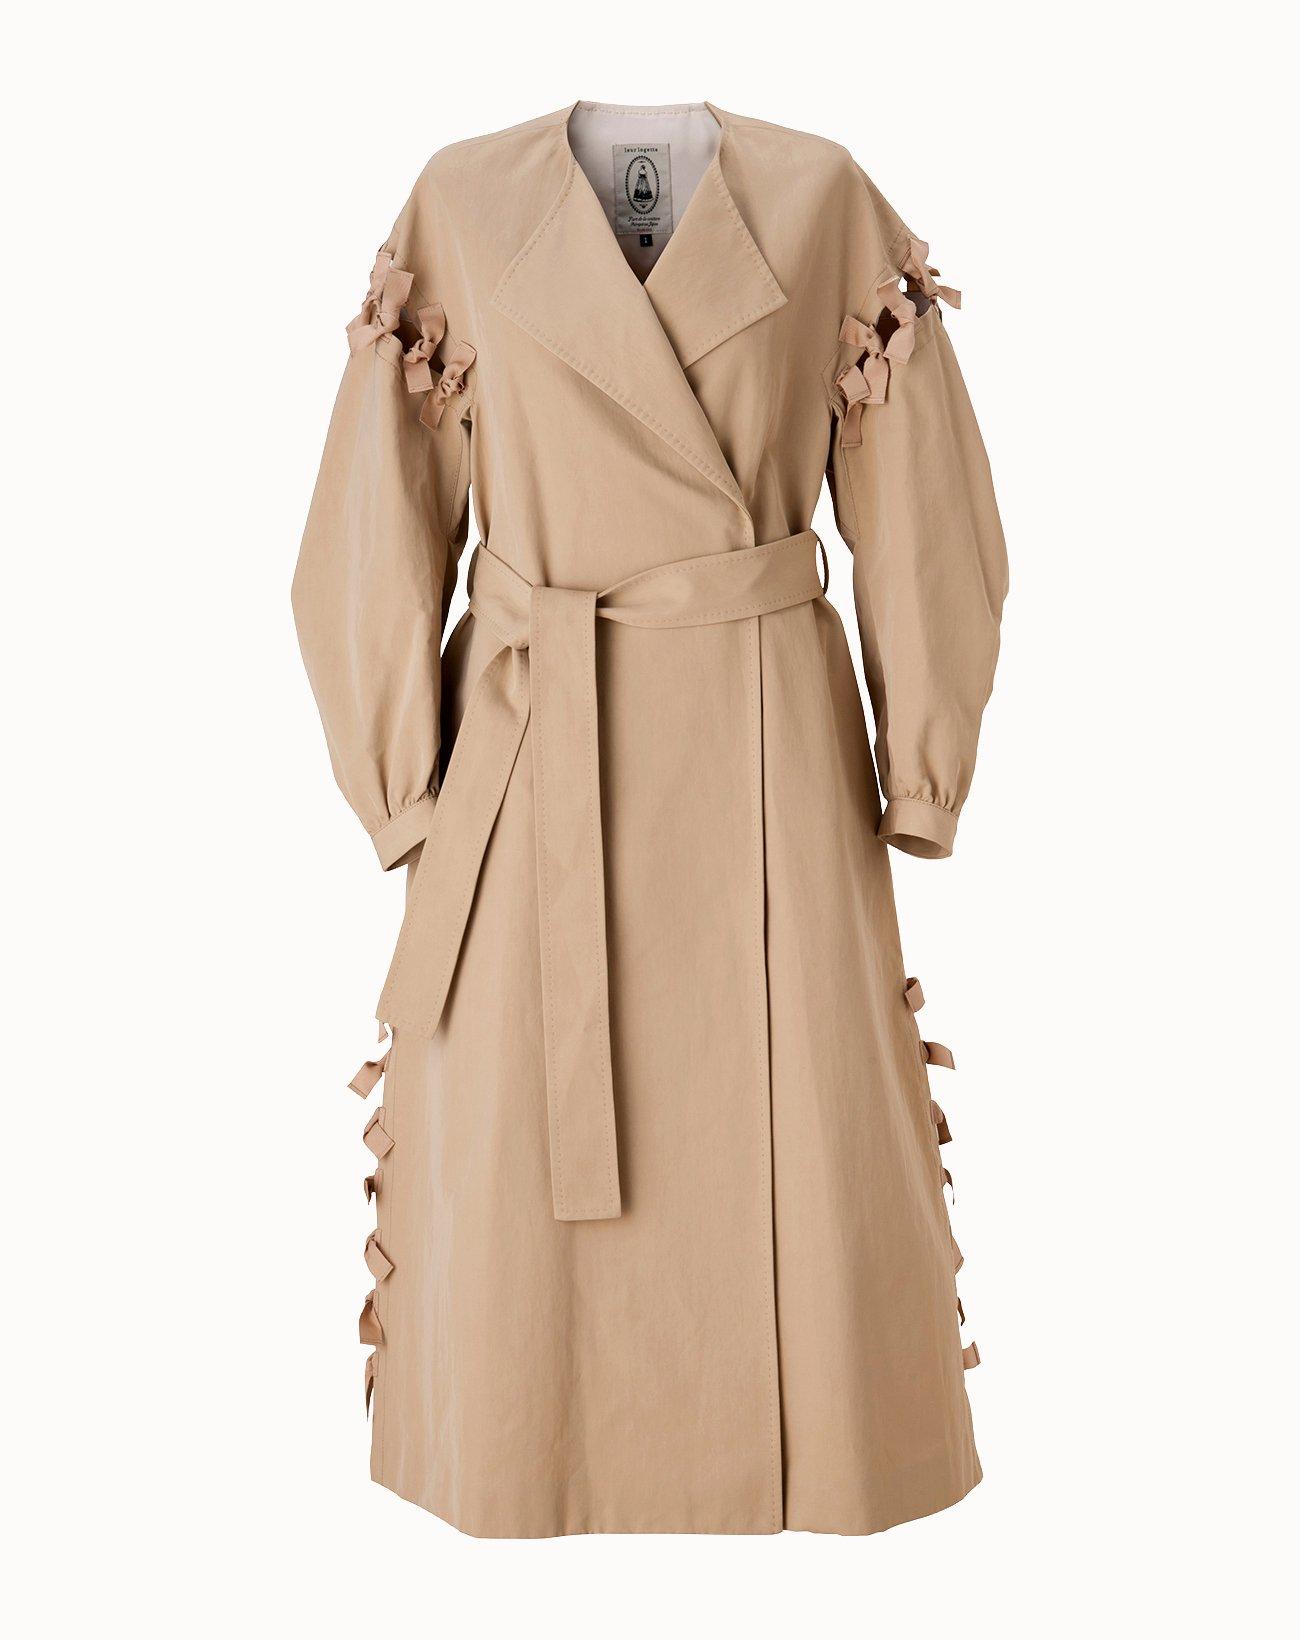 Vintage Twill Coat - Beige